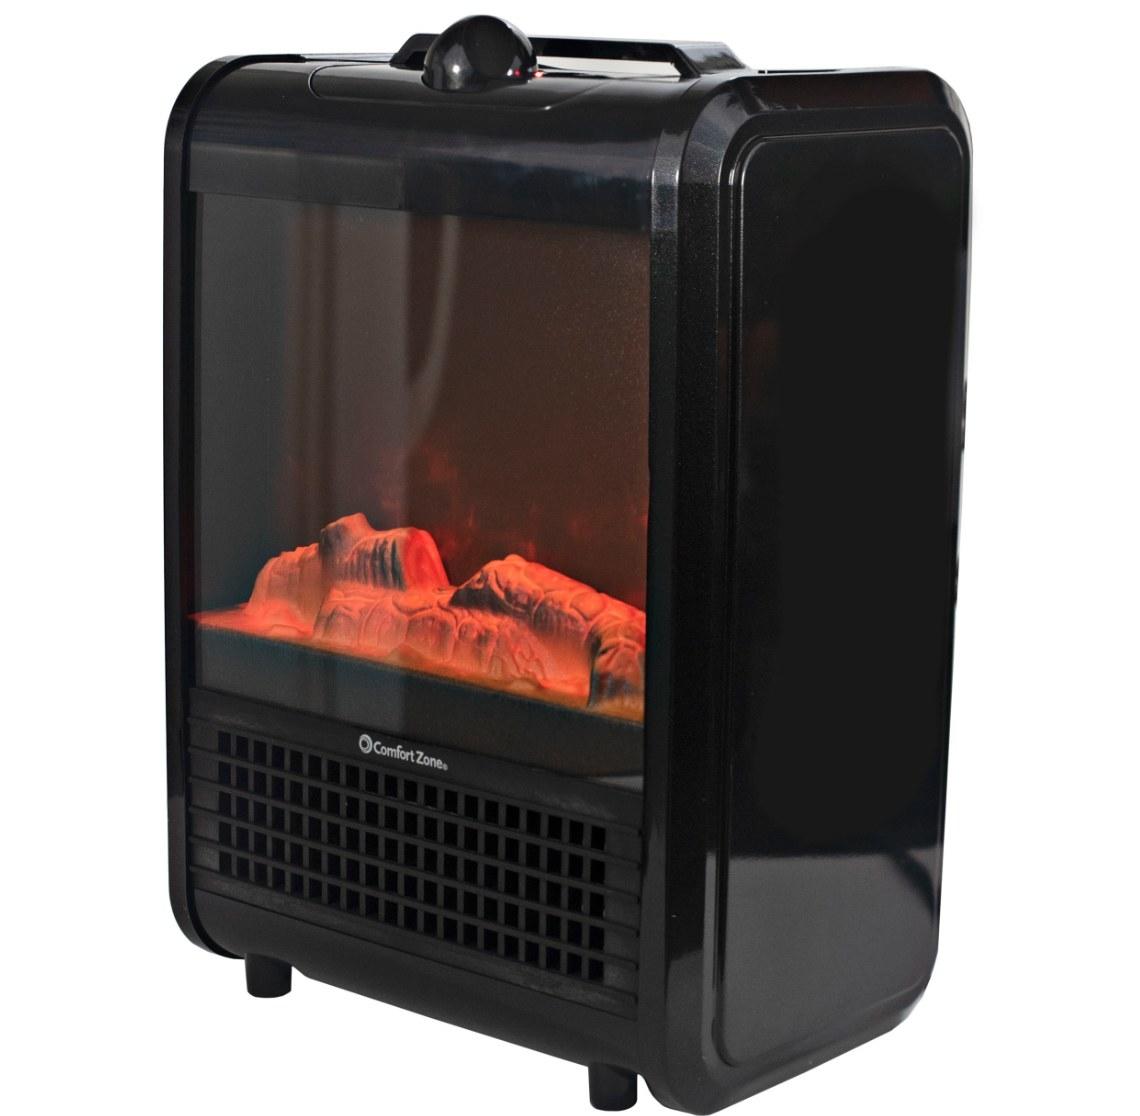 The mini electric fireplace in black